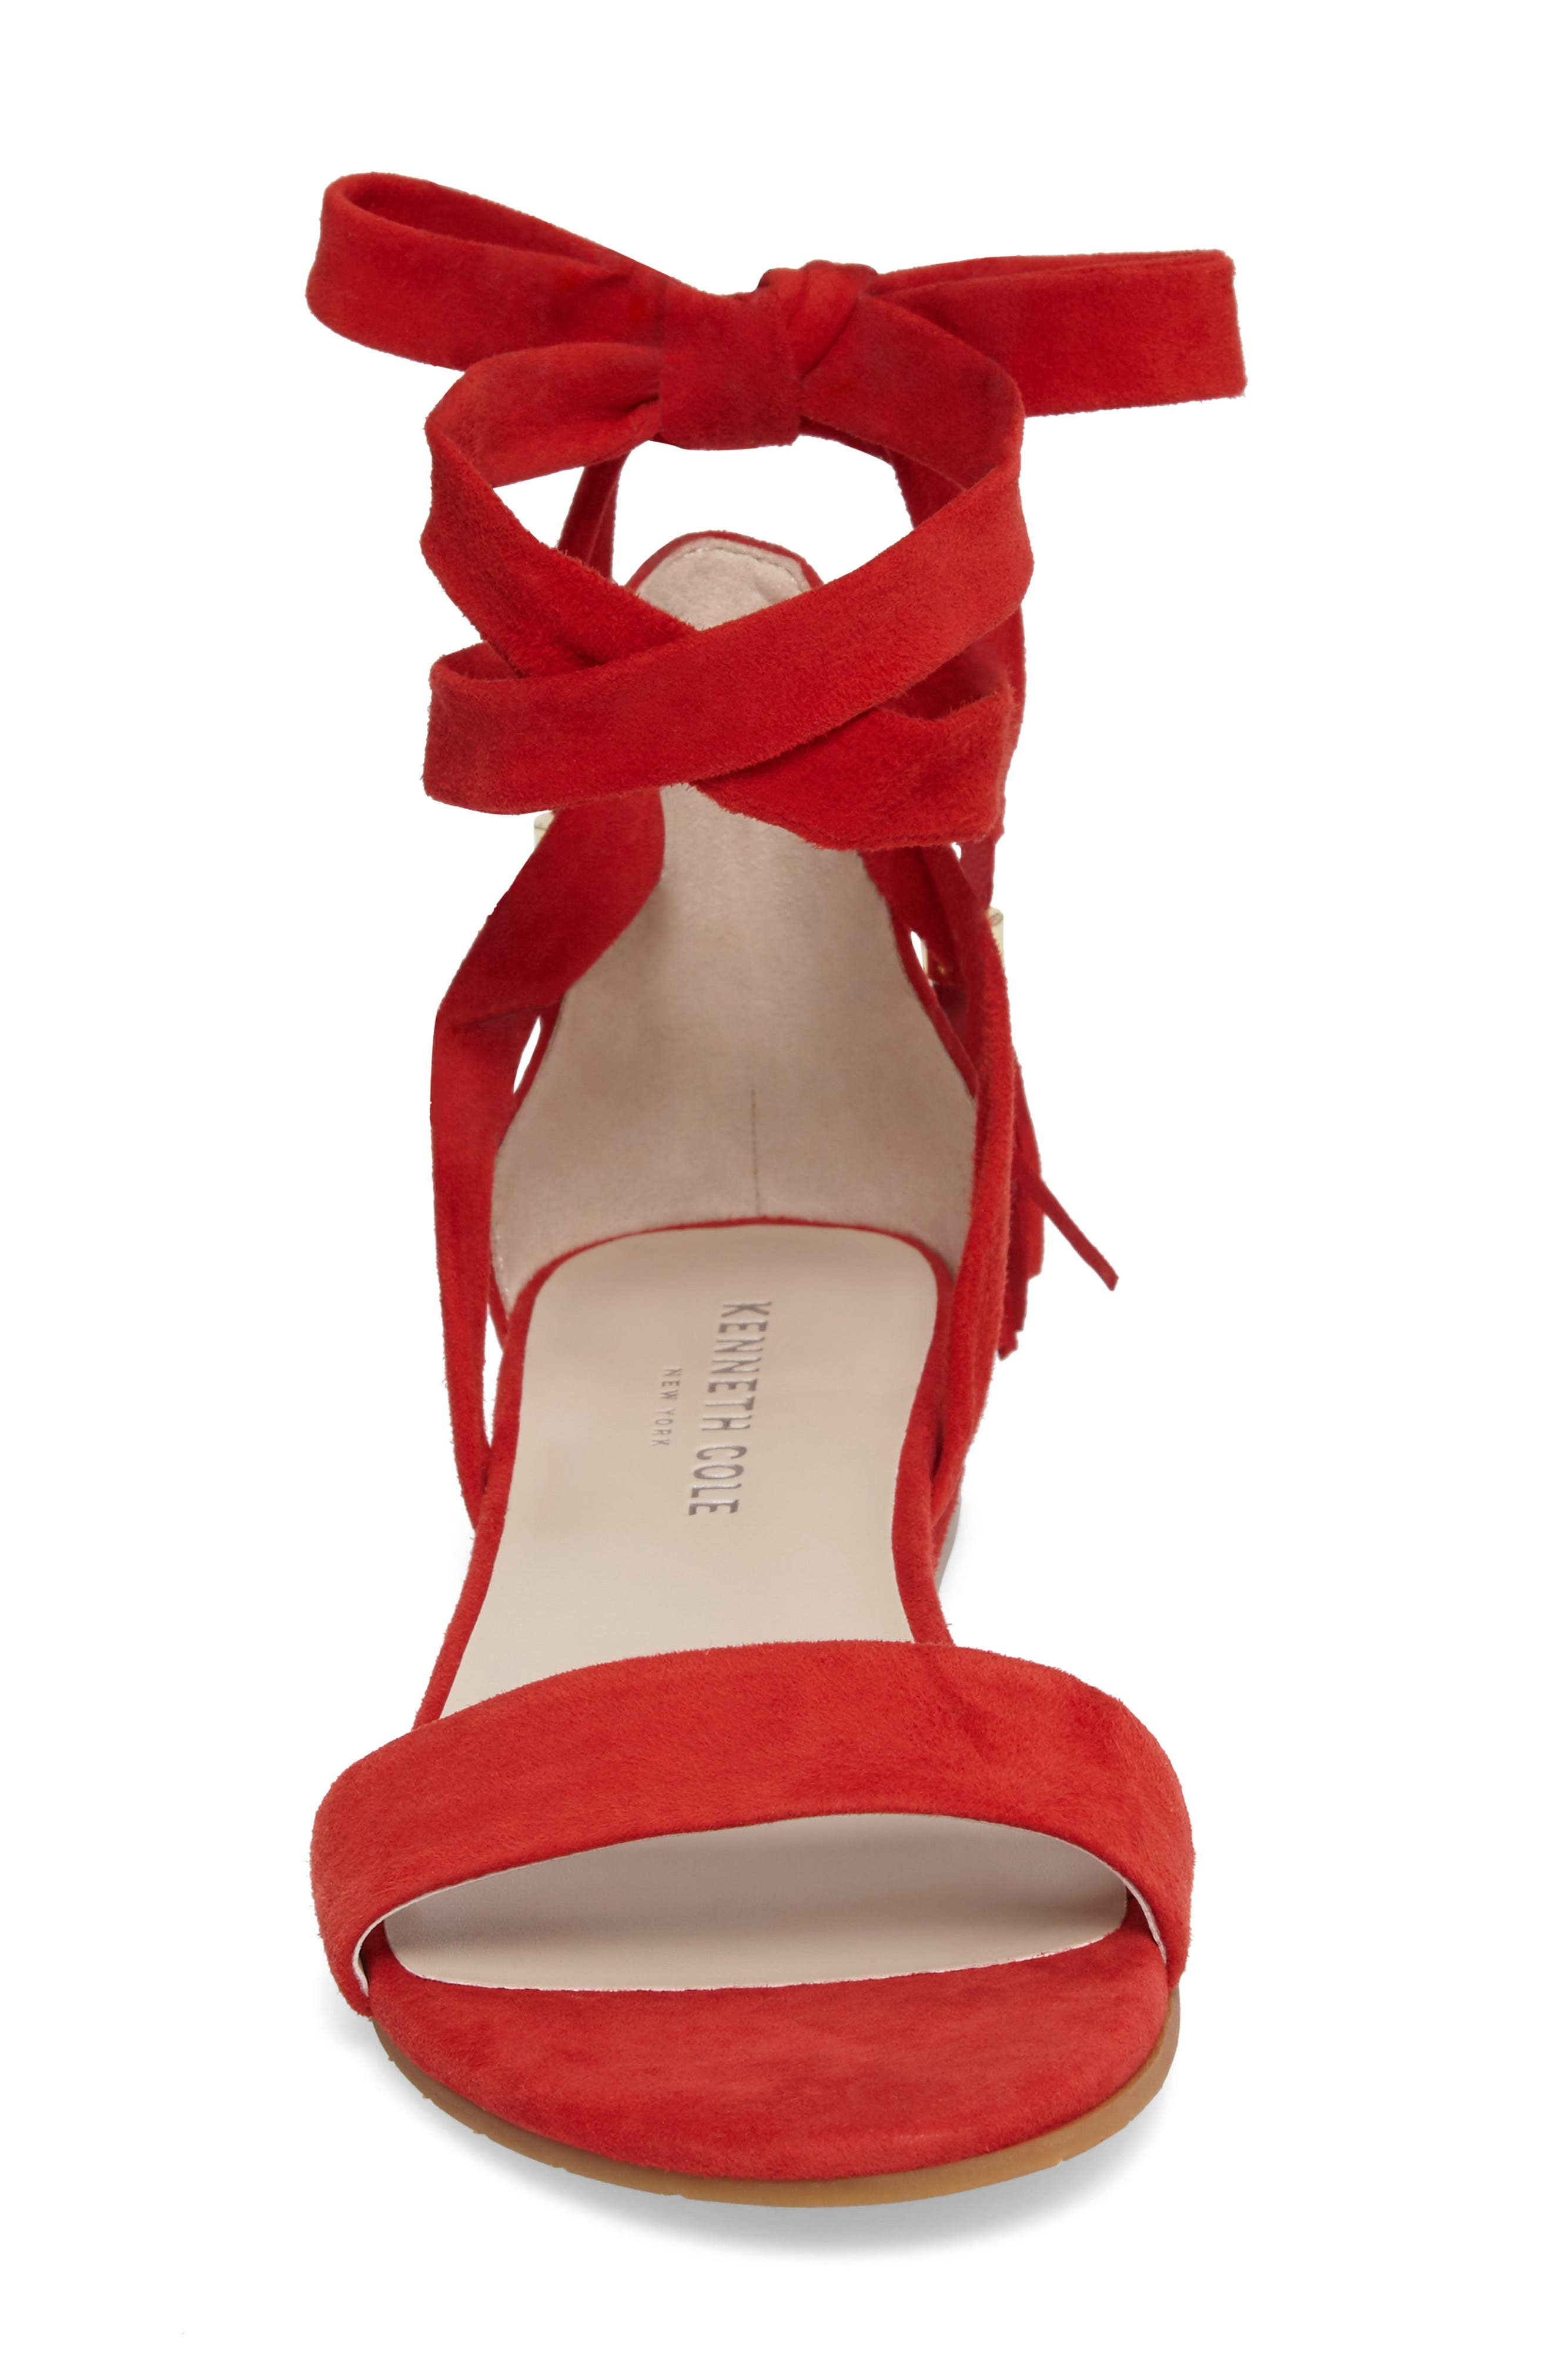 Valen Tassel Lace-Up Sandal,                             Alternate thumbnail 53, color,